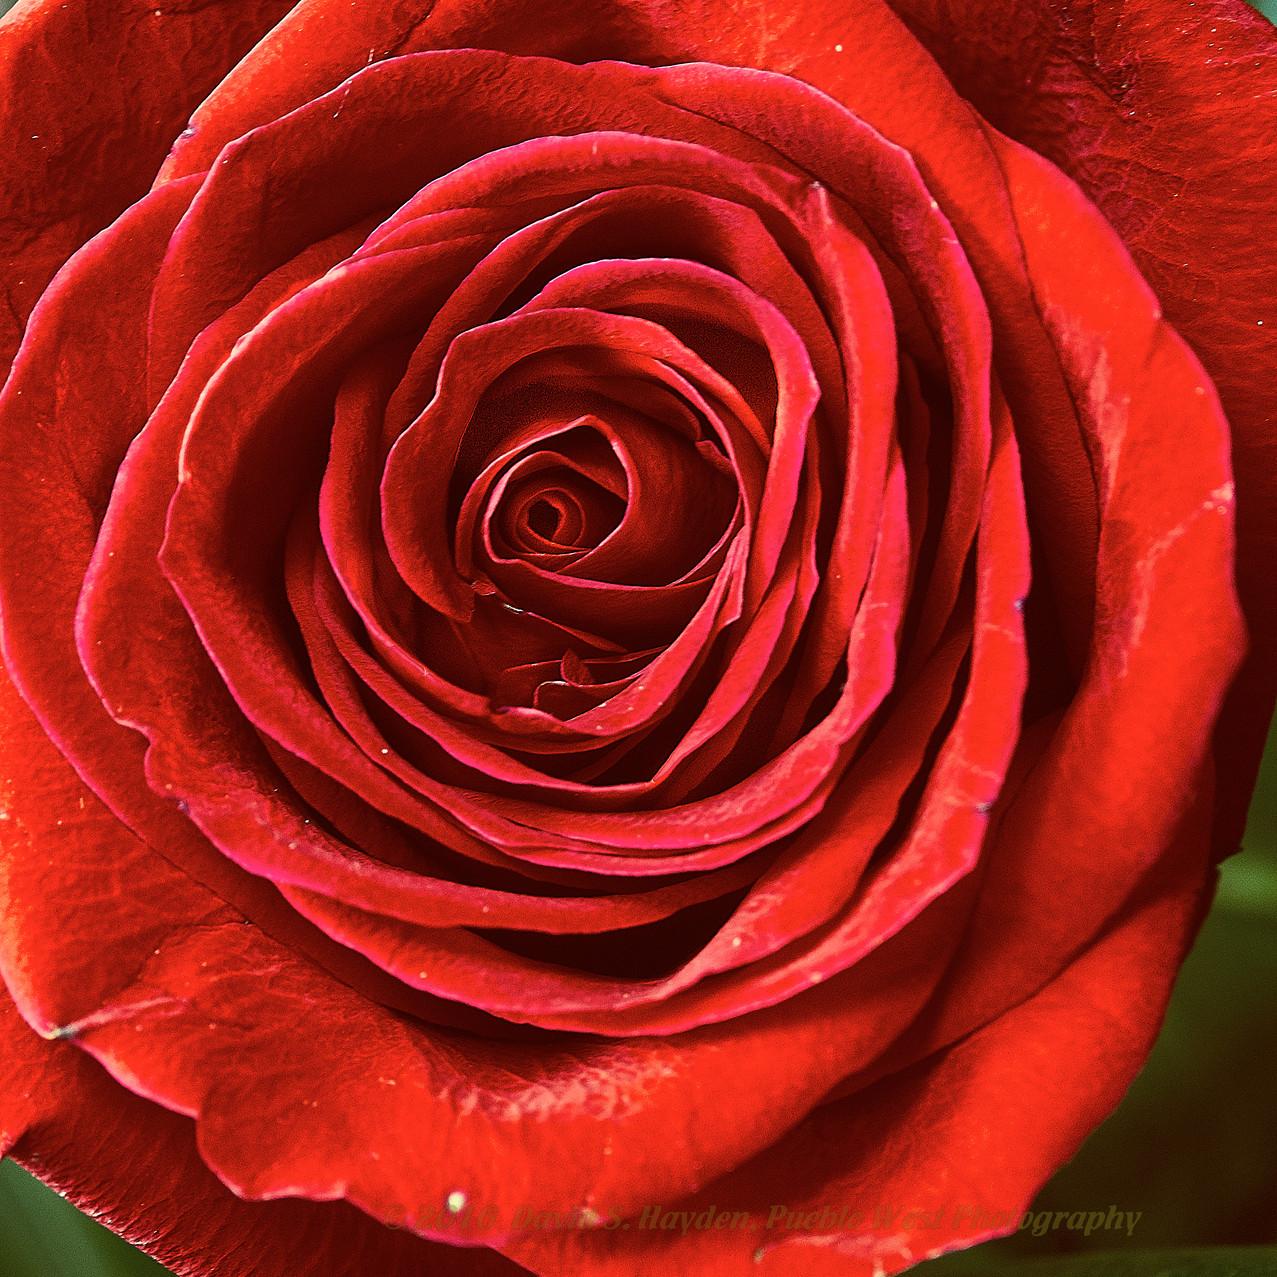 Rose_2017-01-15 1.jpg